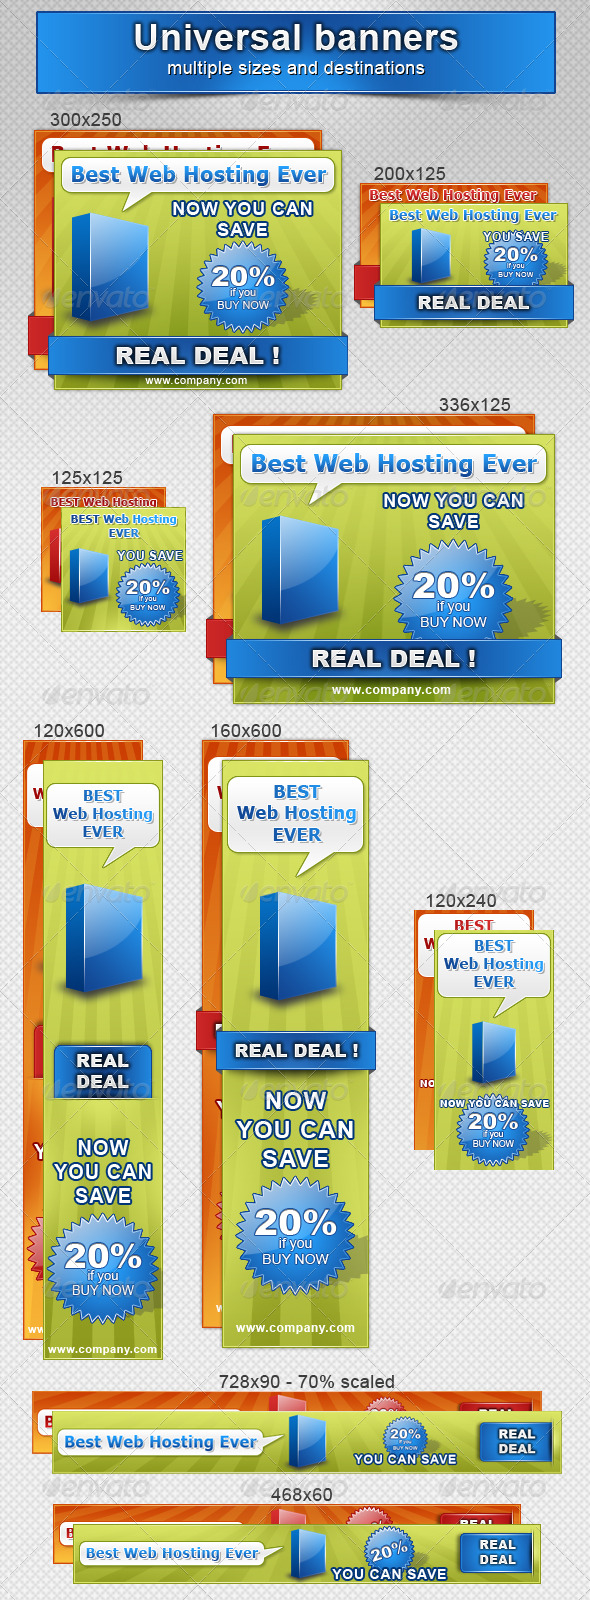 Marketing - Universal Banners - Web Elements